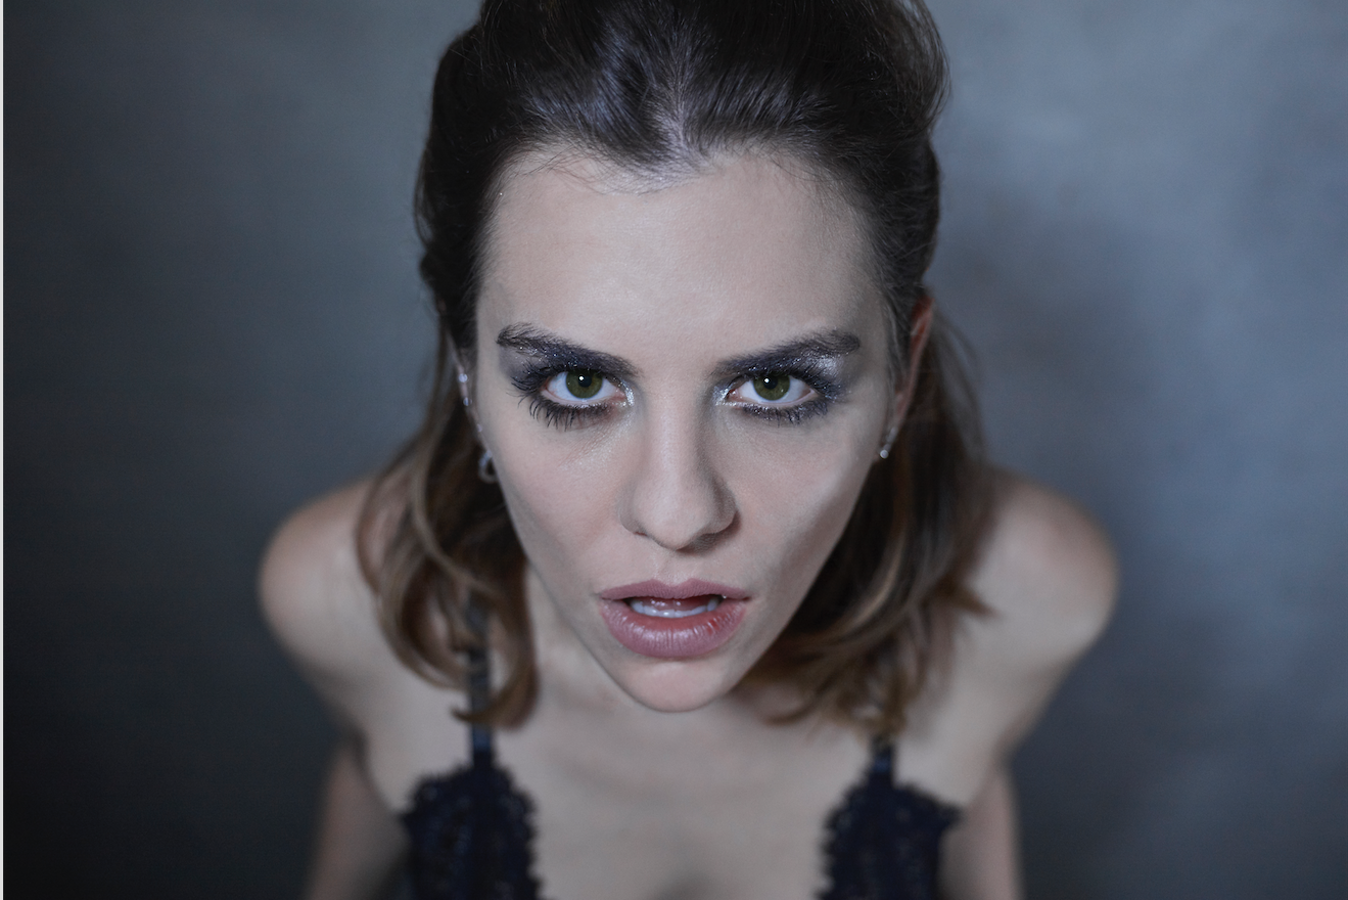 Morgane Polanski